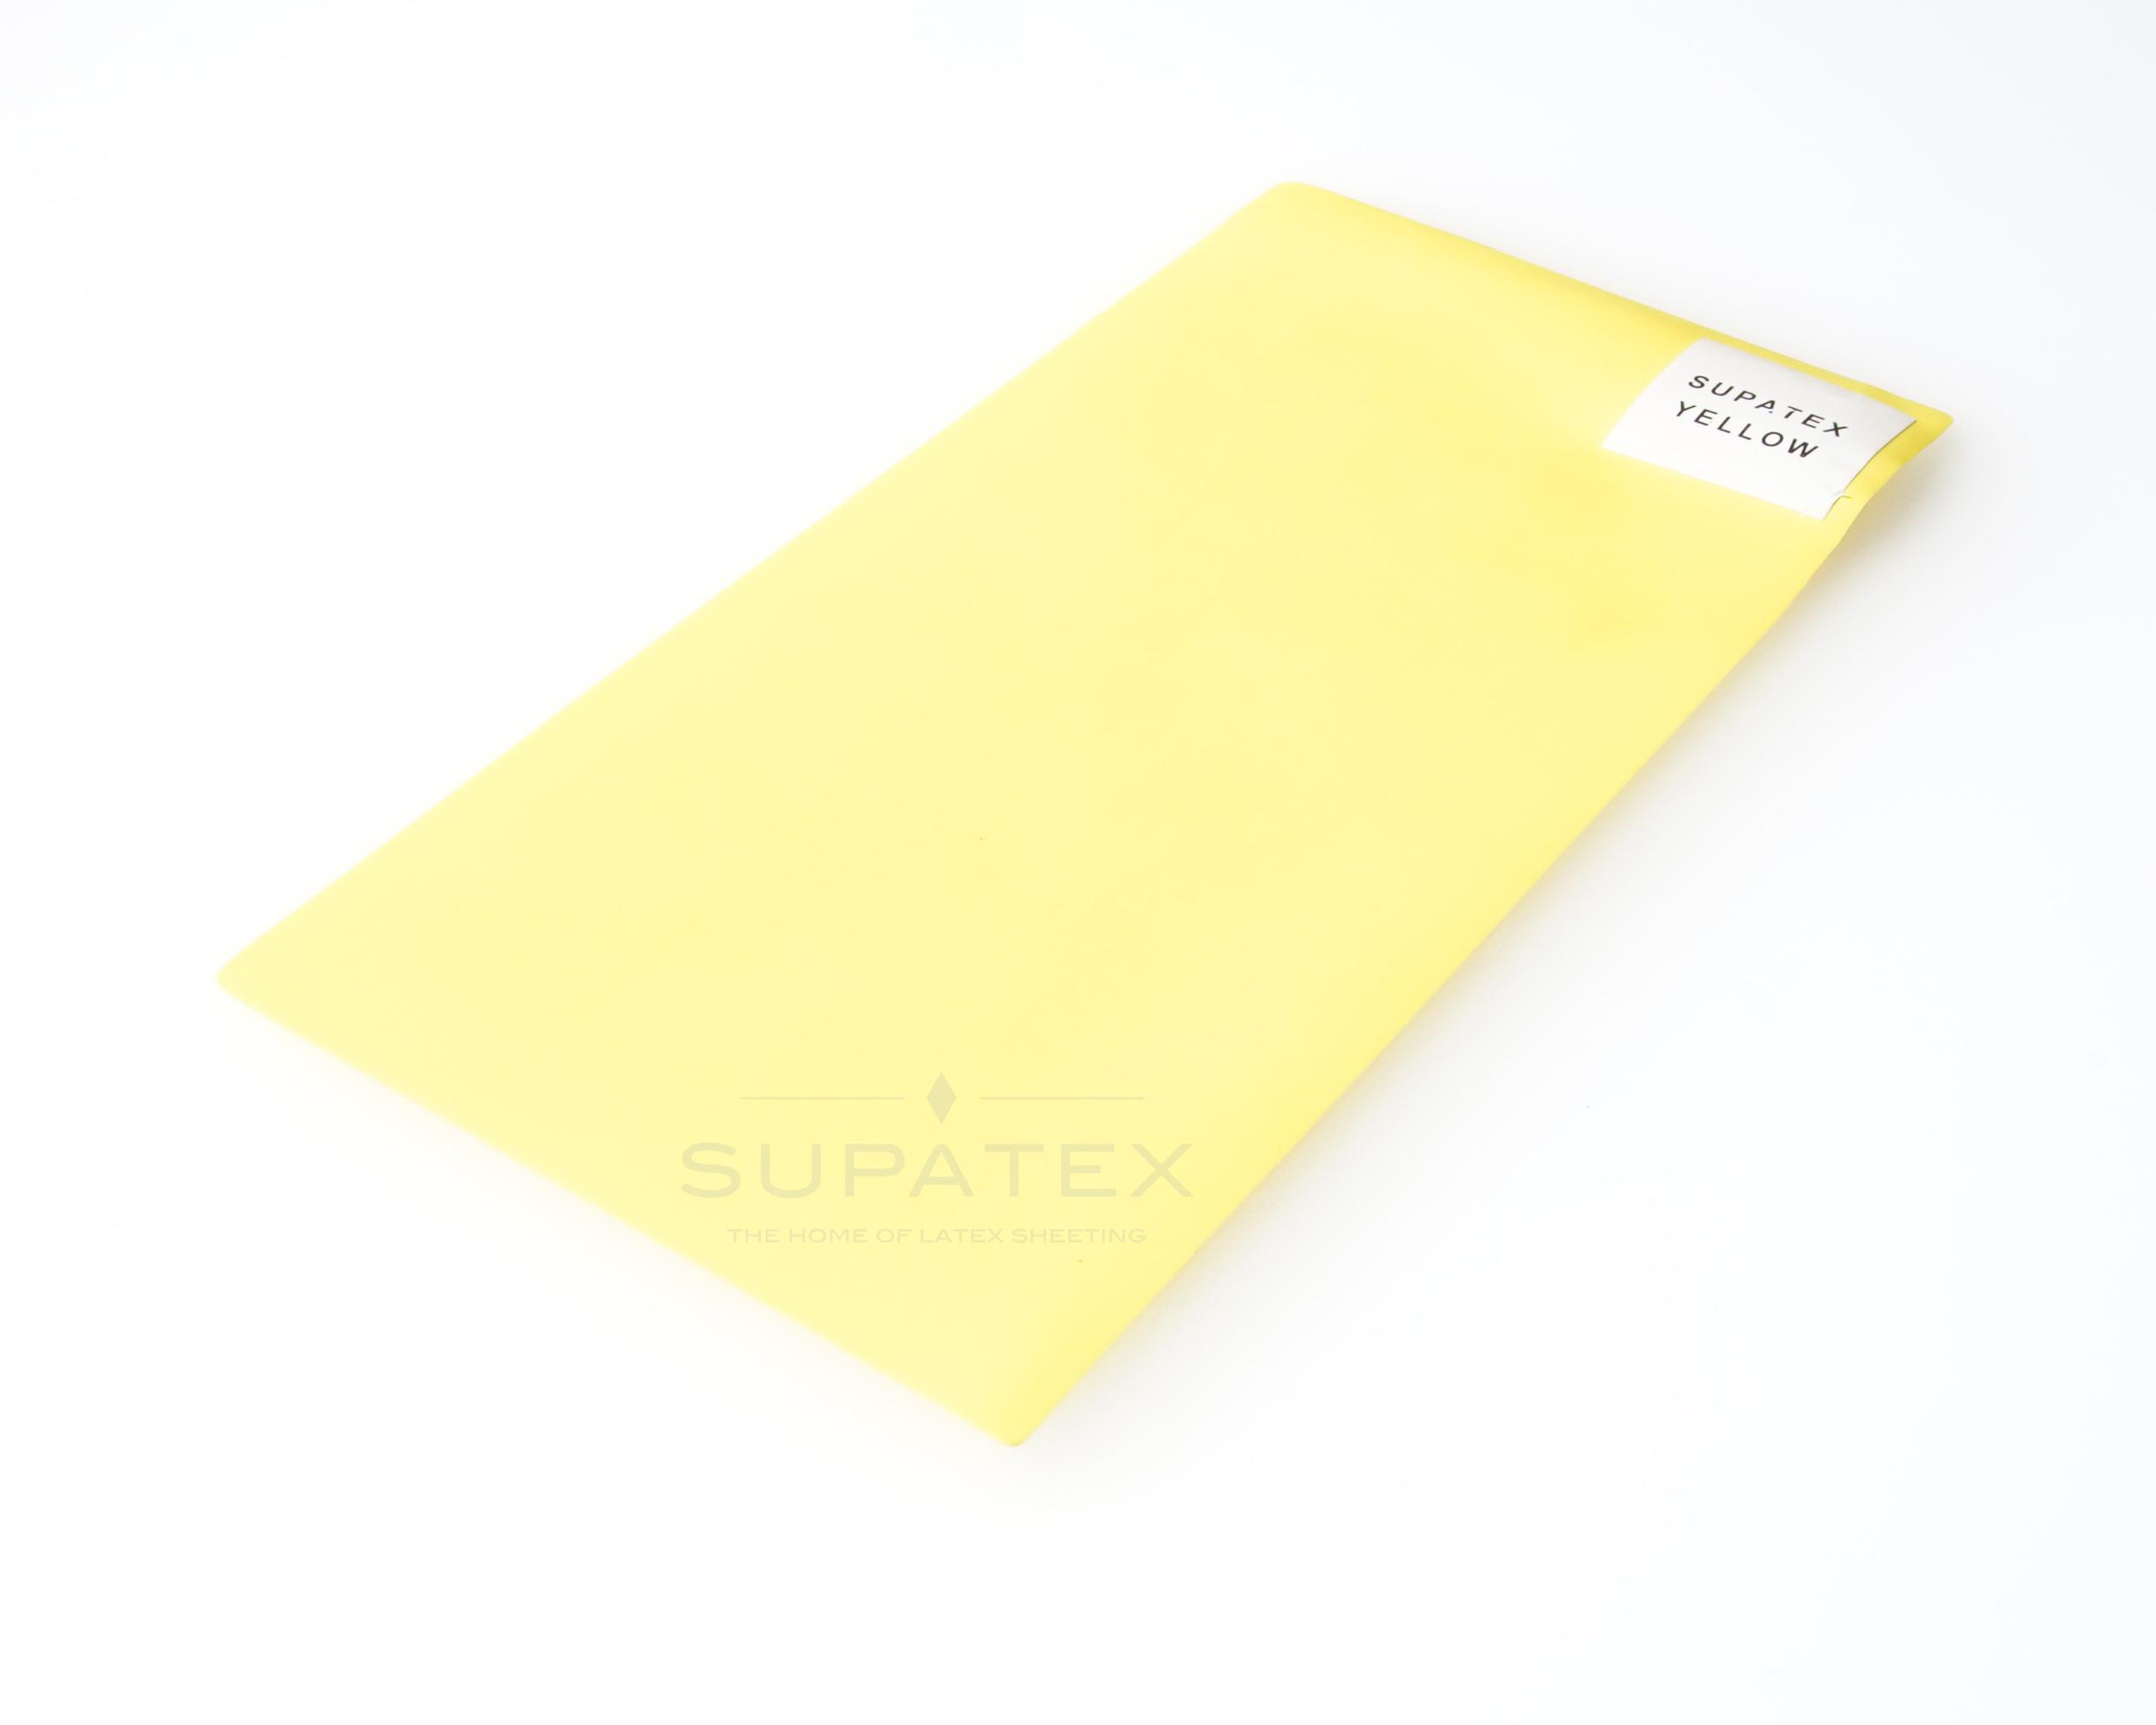 Supatex Yellow 0.33 mm